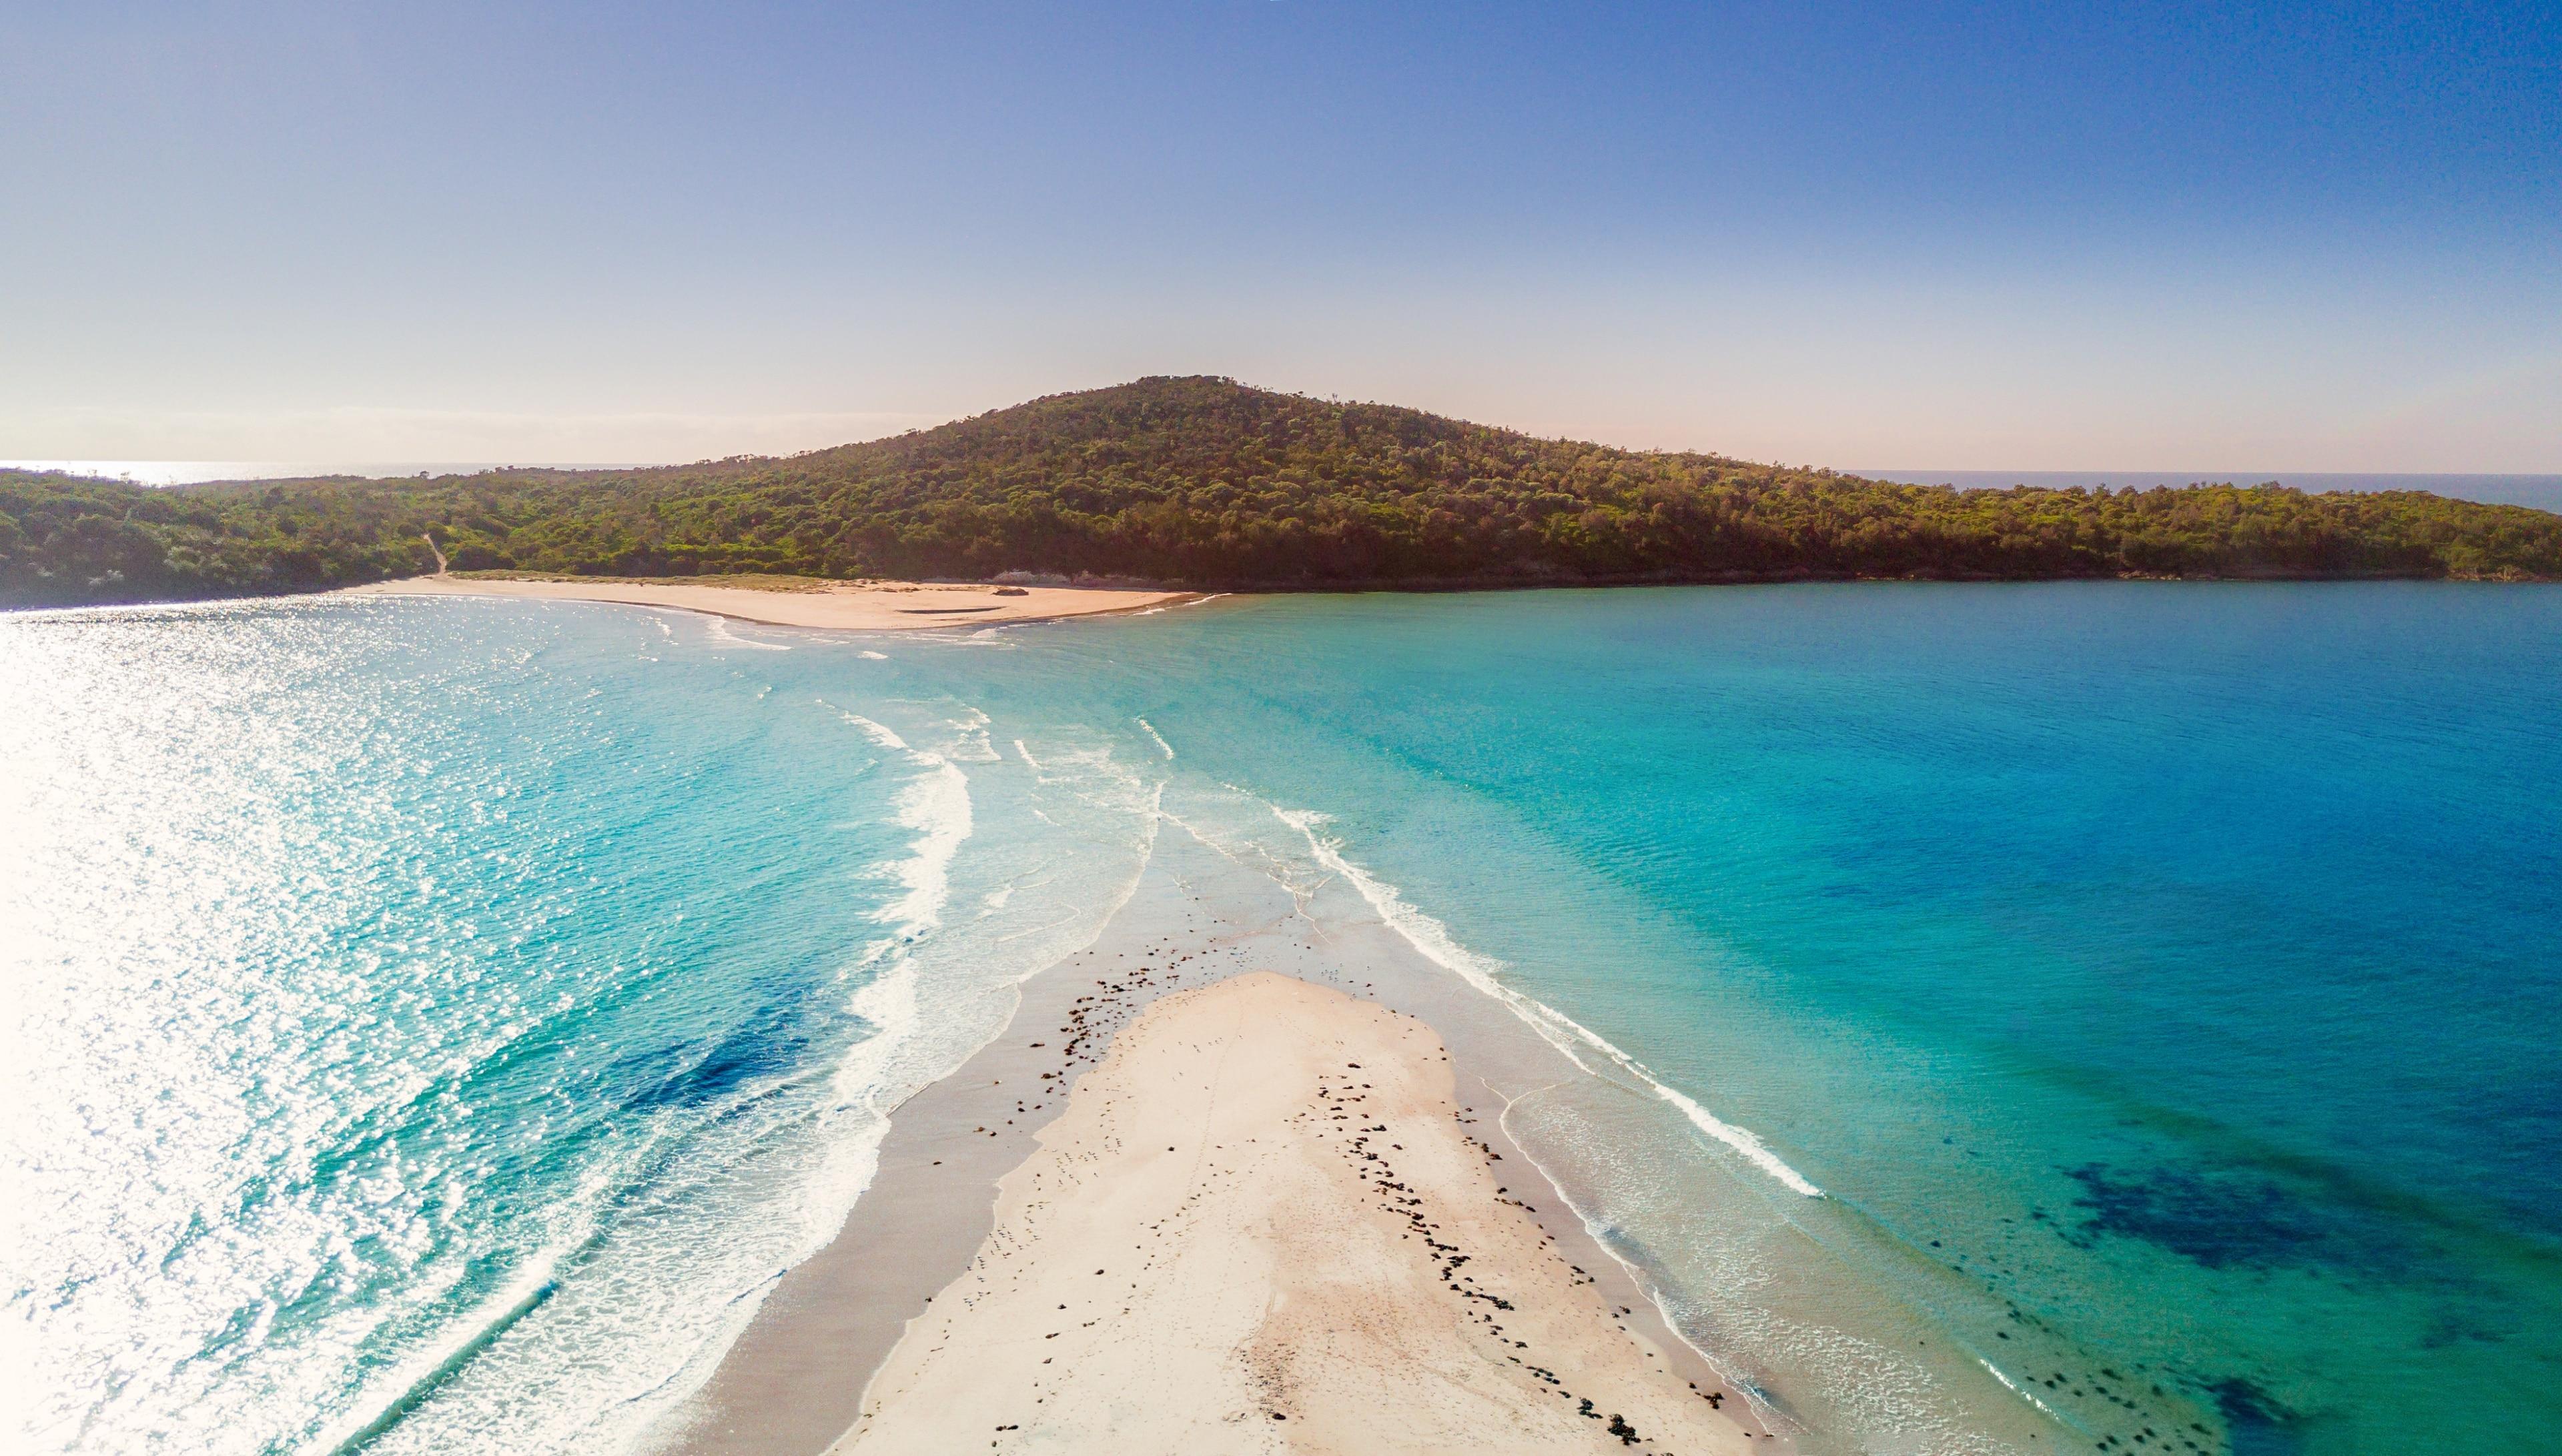 Fingal Bay, New South Wales, Australia